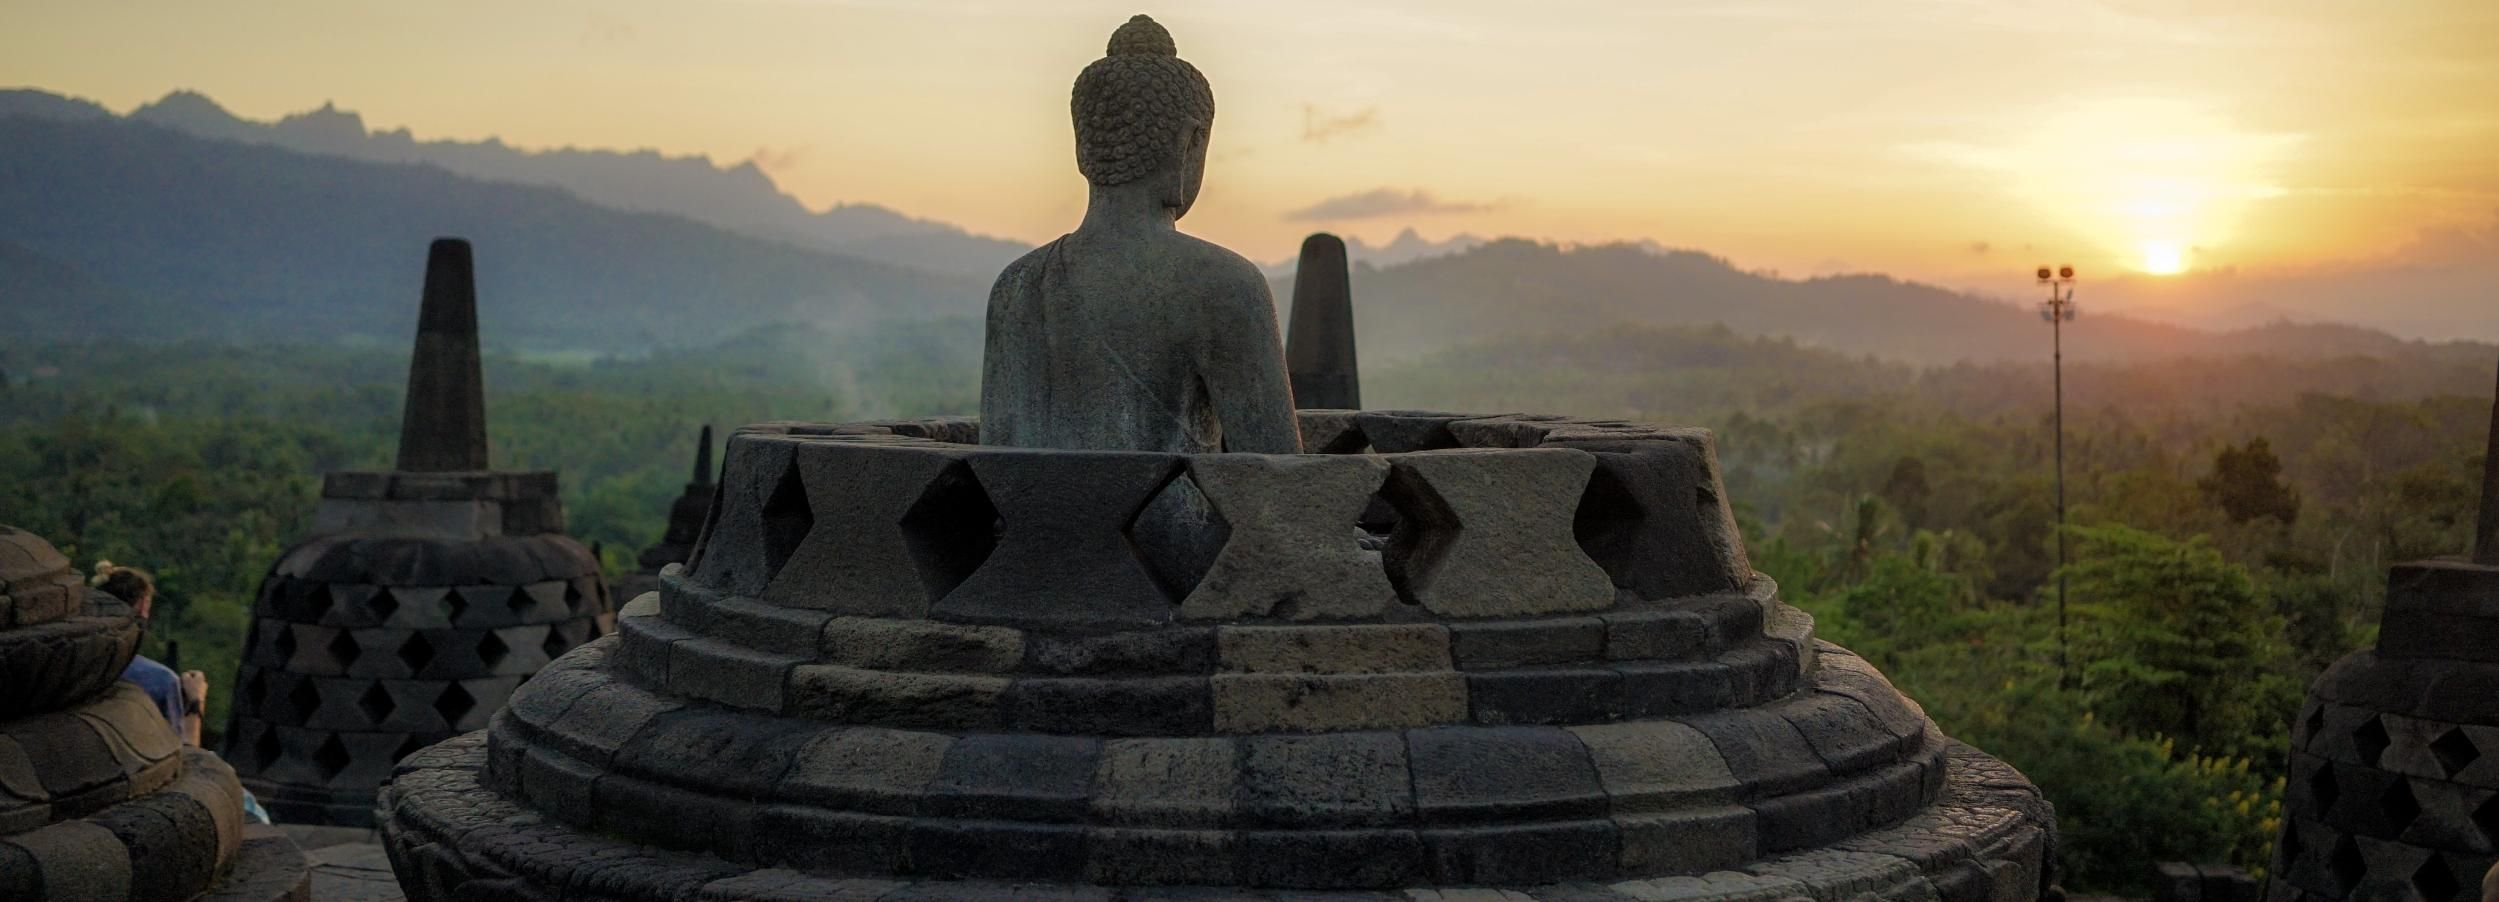 Borobudur Sunrise & Prambanan Full Day Private Tour